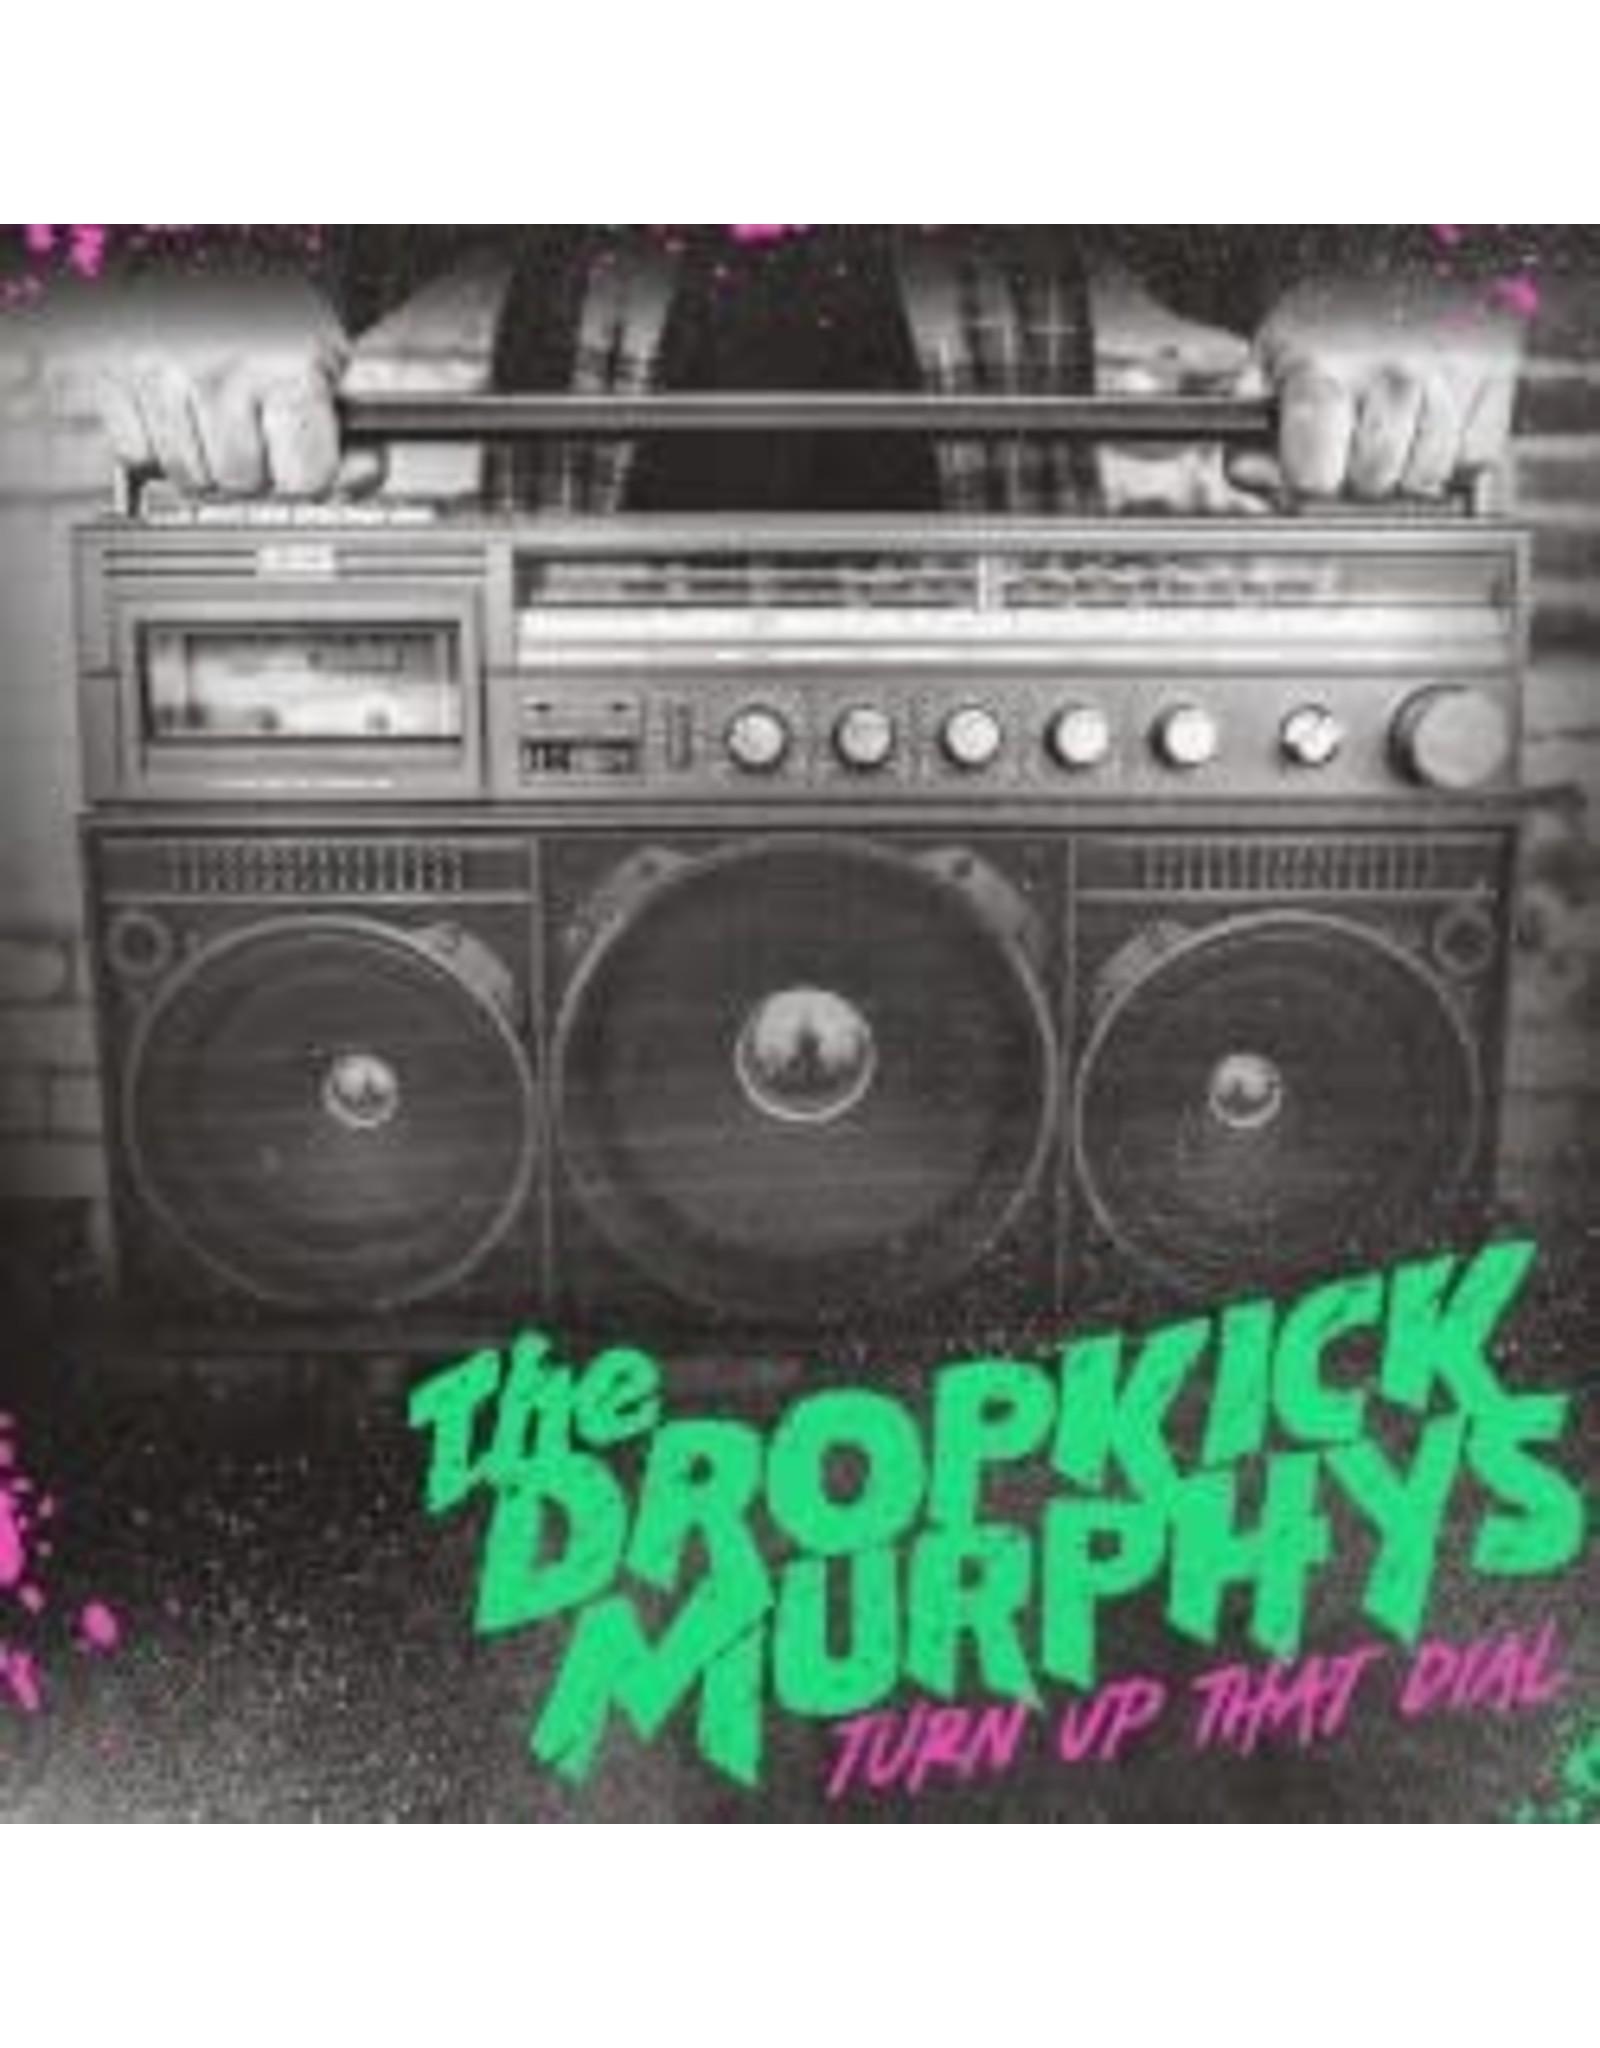 Dropkick Murphys - Turn Up That Dial LP